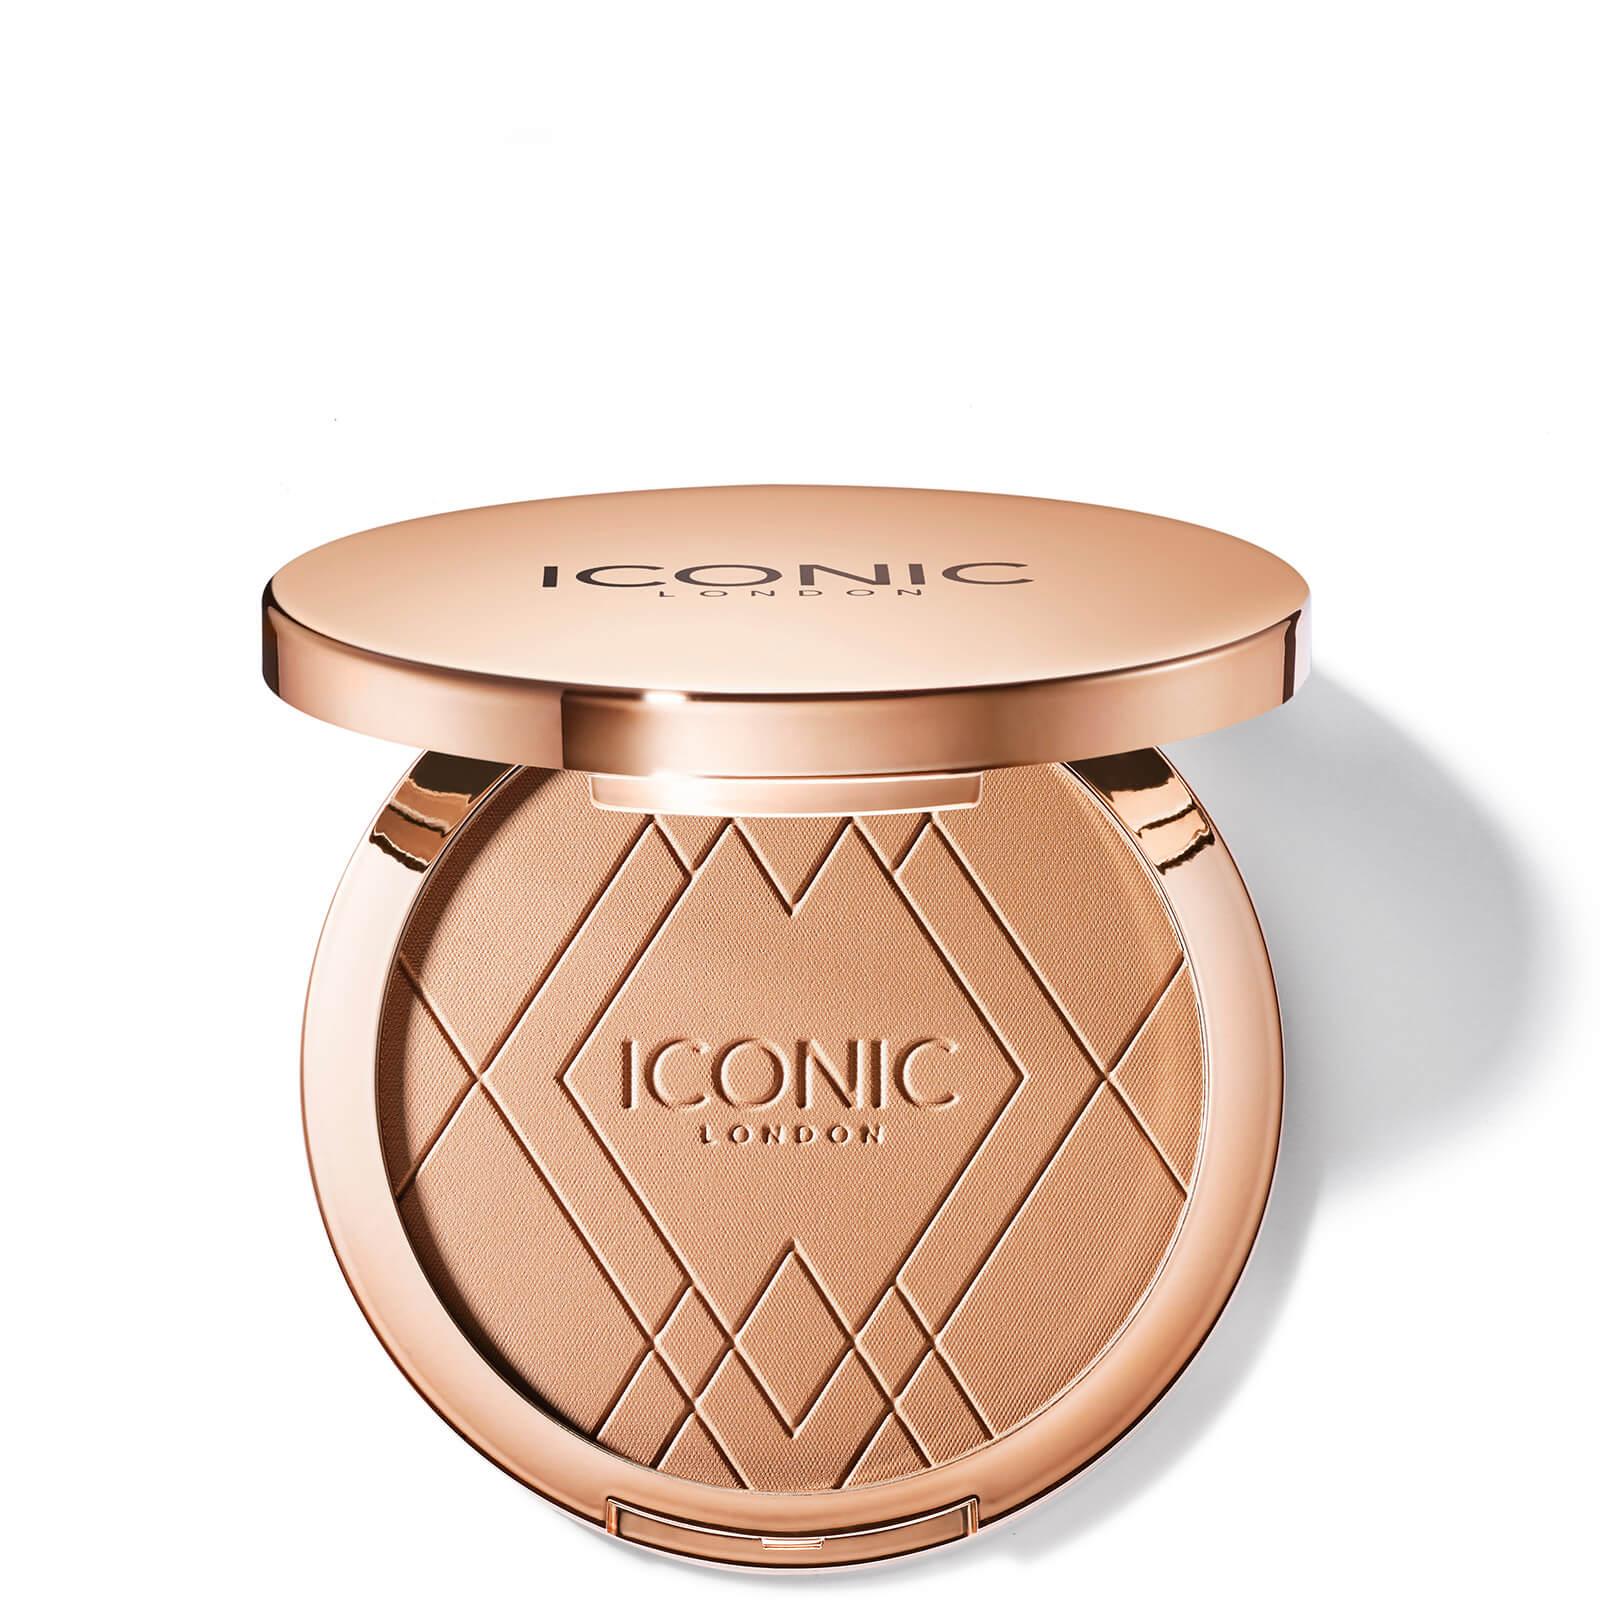 Купить ICONIC London Ultimate Bronzing Powder 17g (Various Shades) - Light Bronze